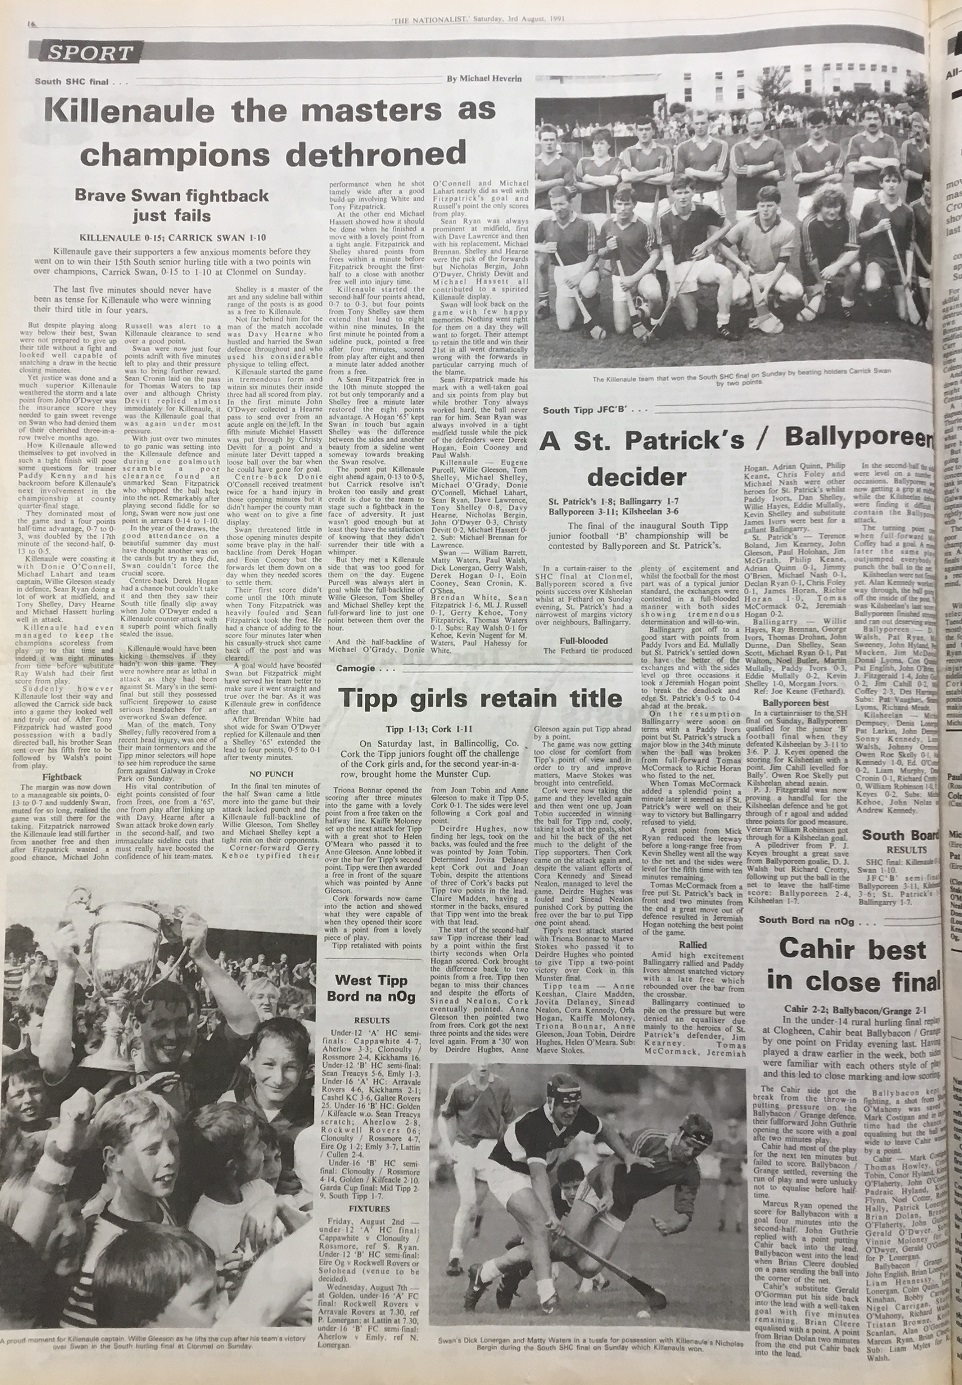 1991 South hurling final